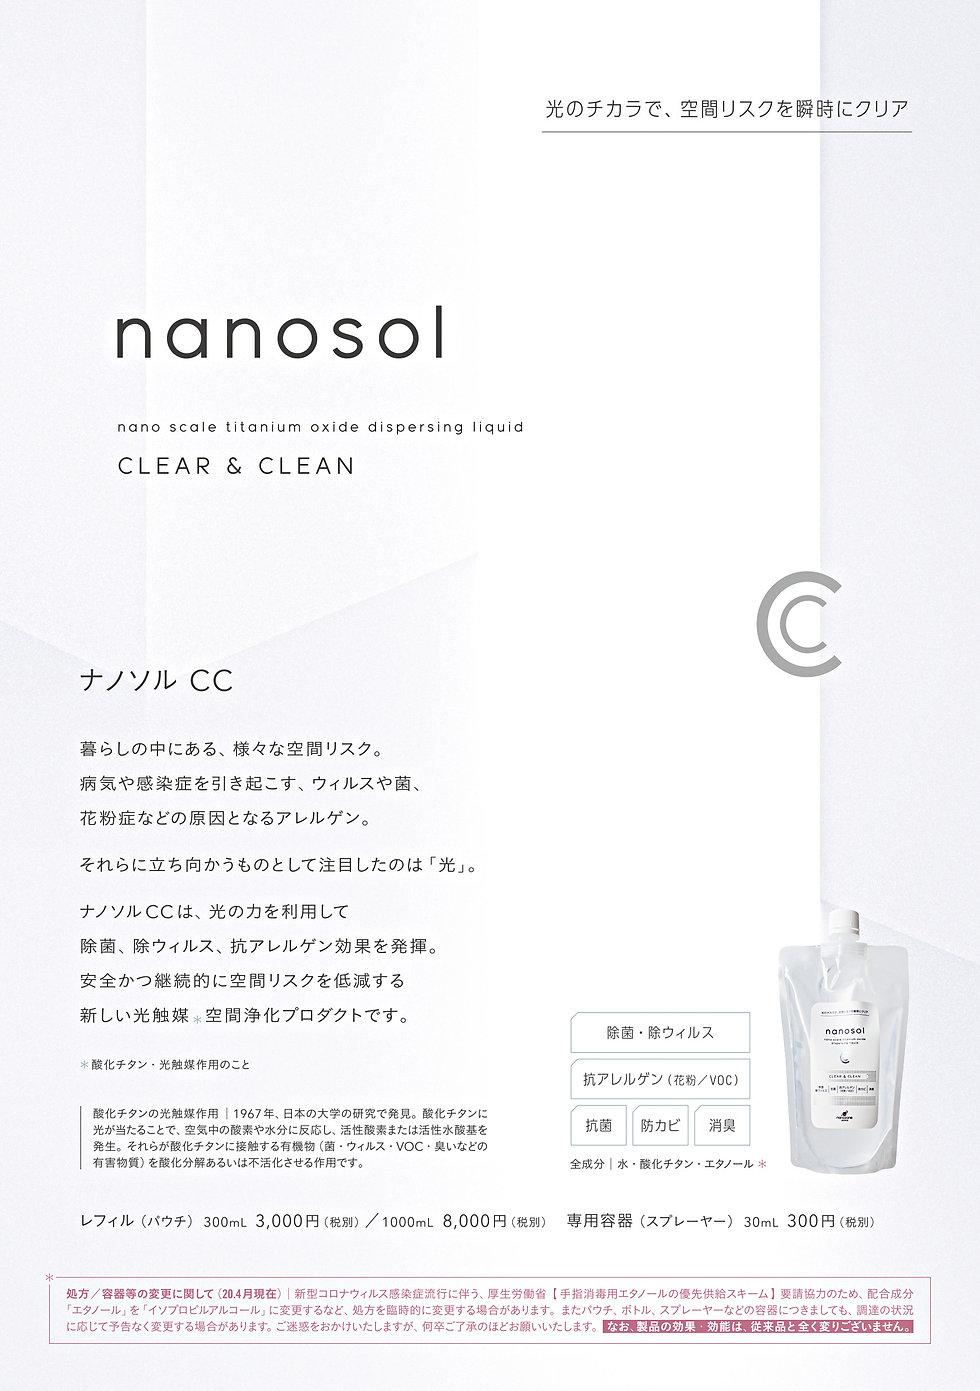 200407_nanosol_A5_ex01.jpg